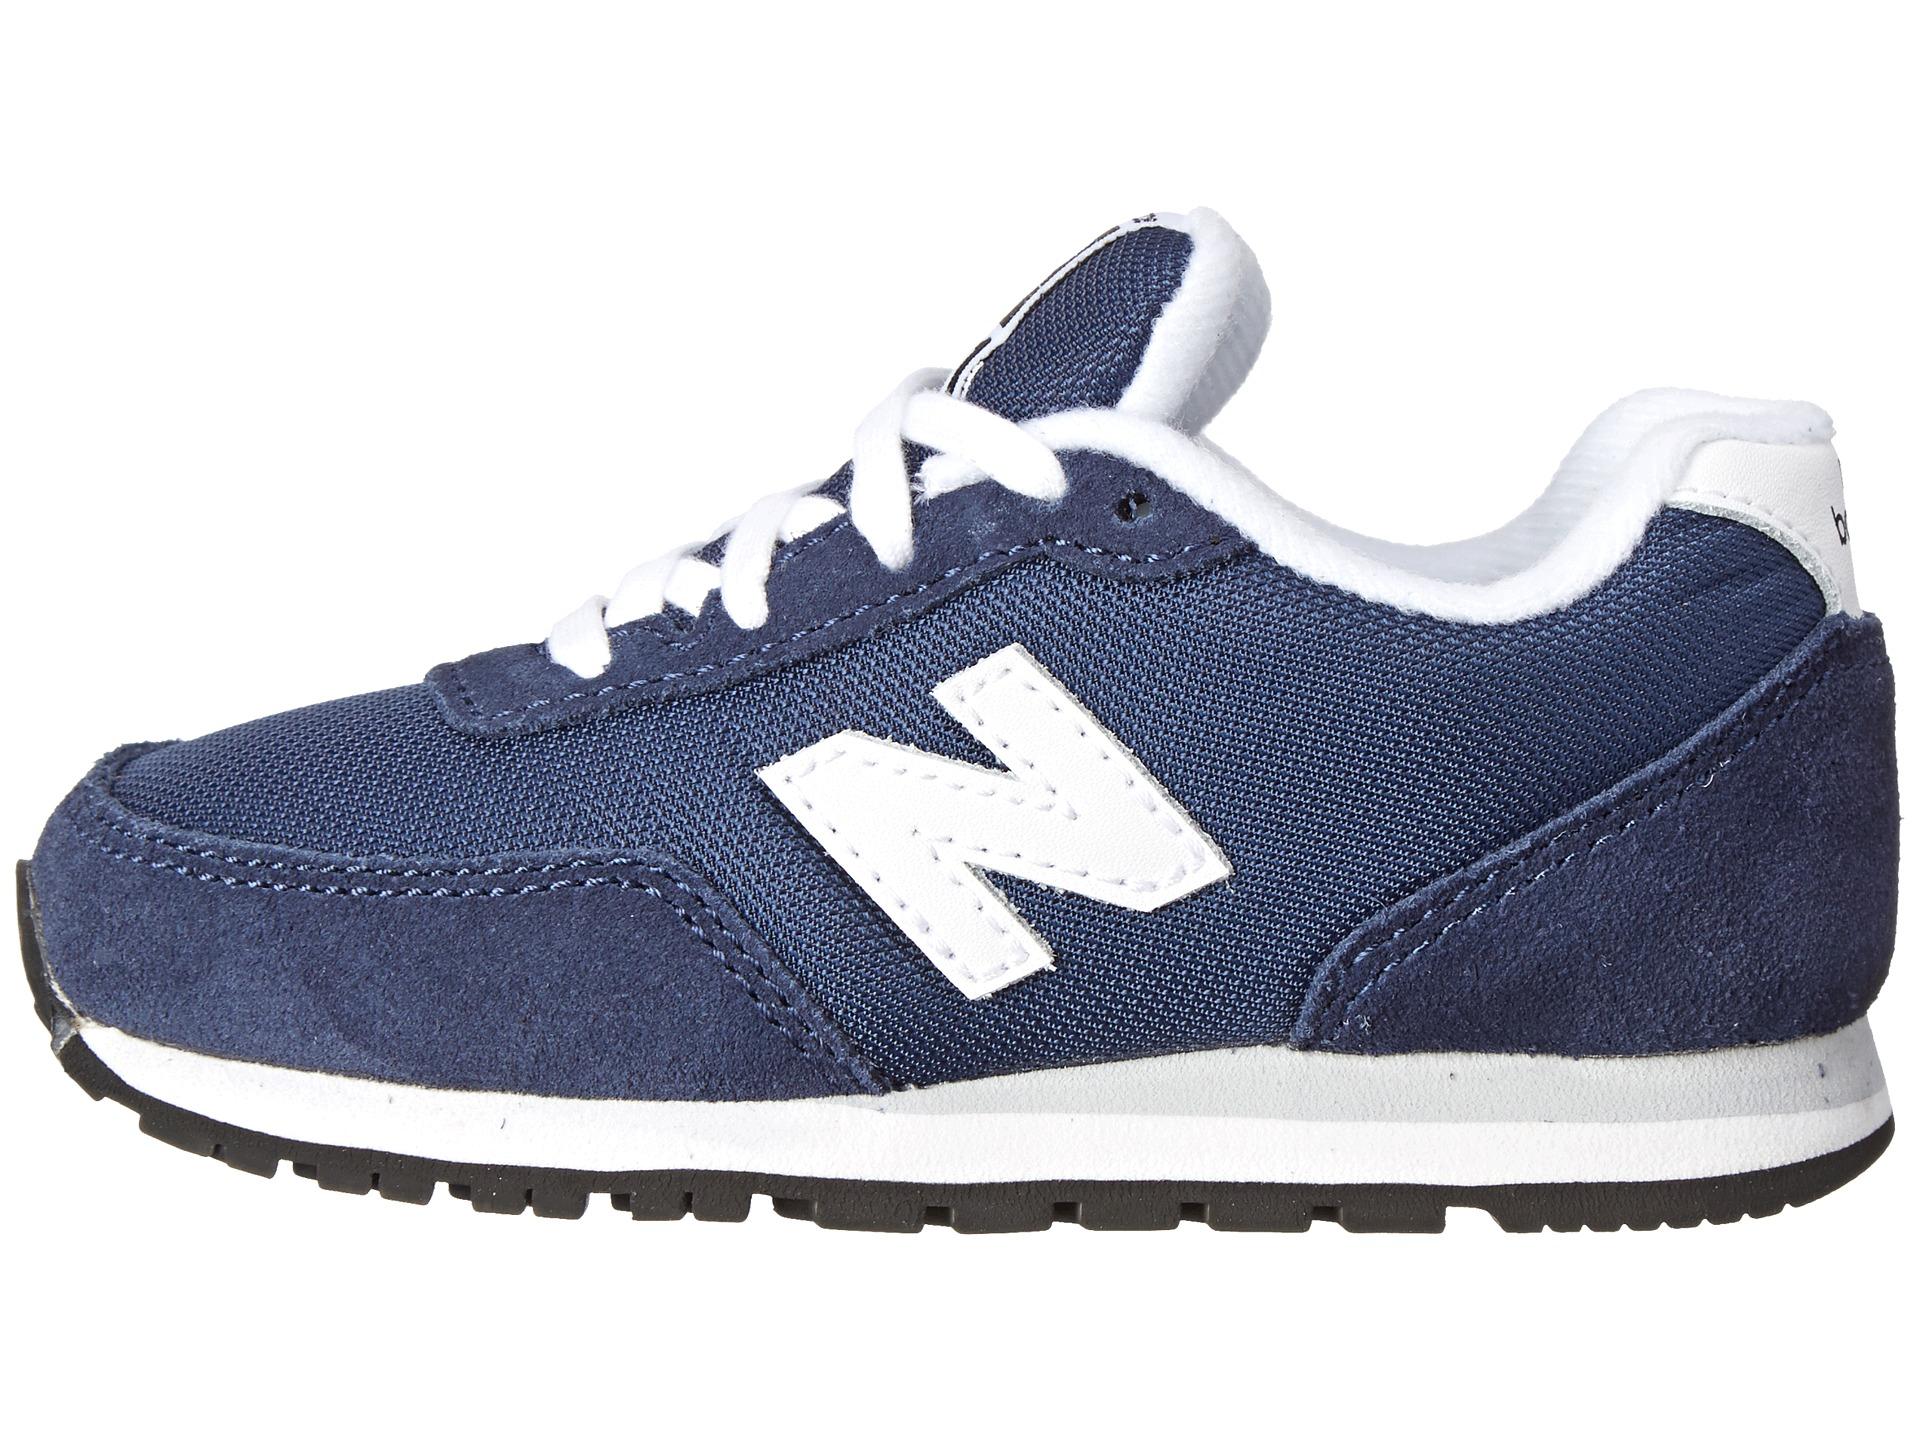 New Balance Narrow Toddler Shoes